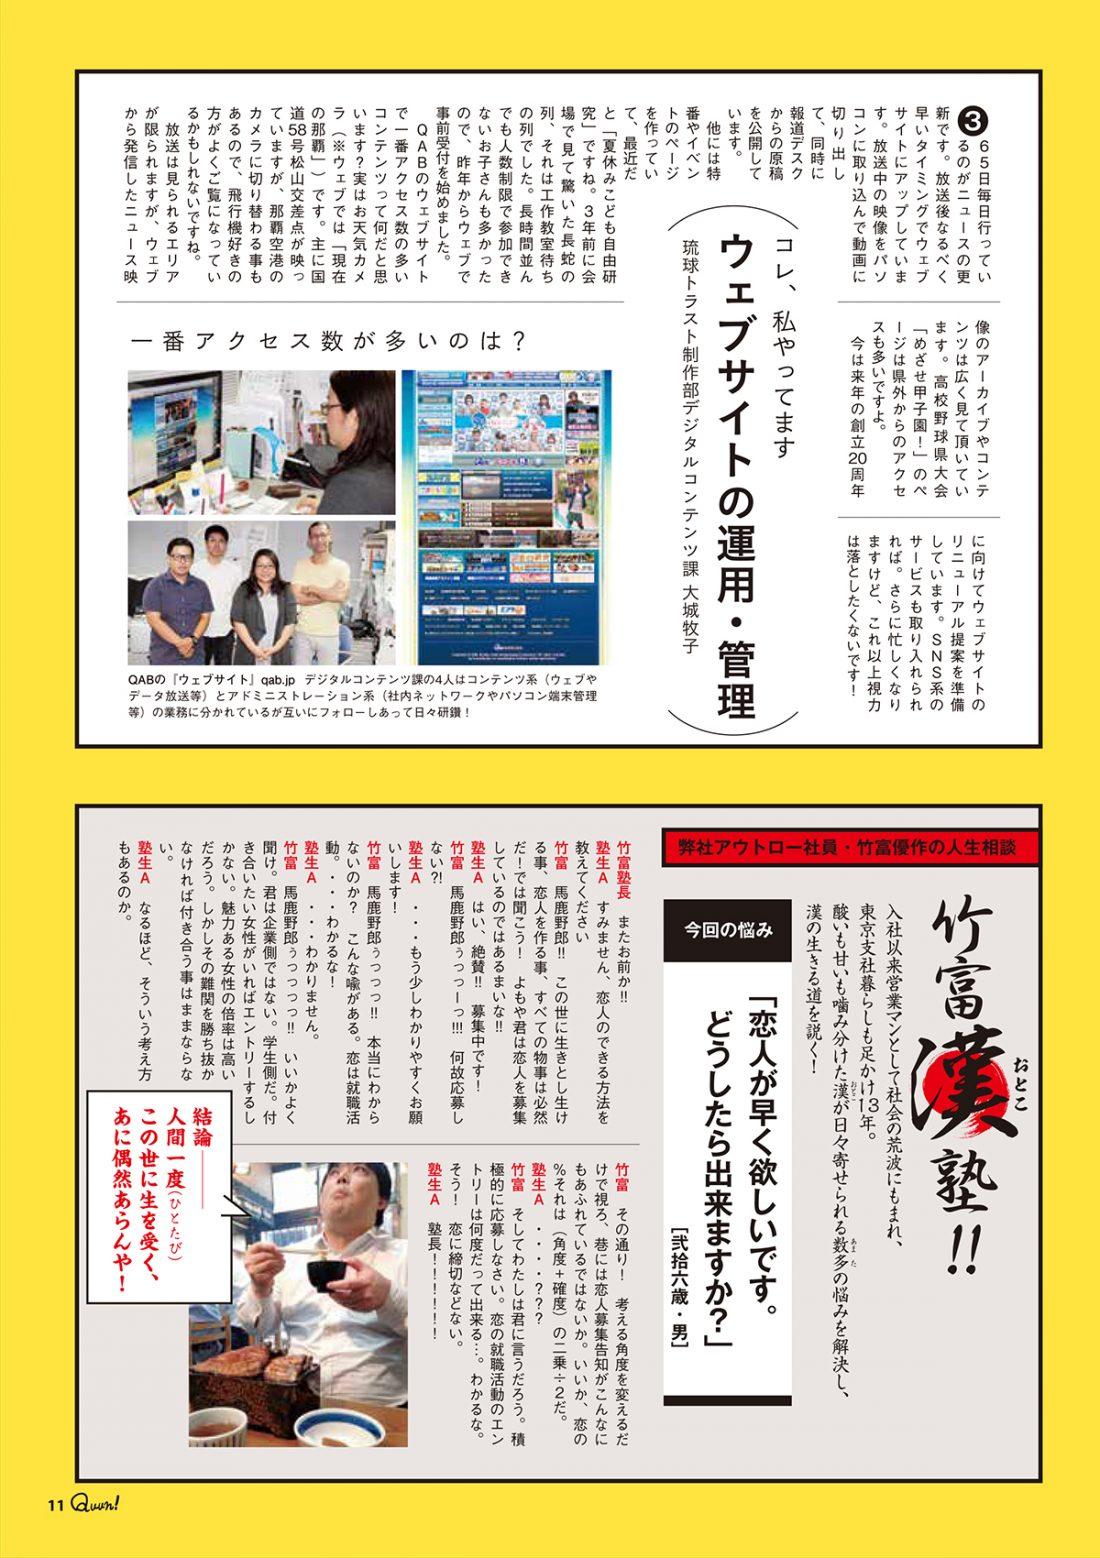 https://www.qab.co.jp/qgoro/wp-content/uploads/quun_0213-1100x1558.jpg